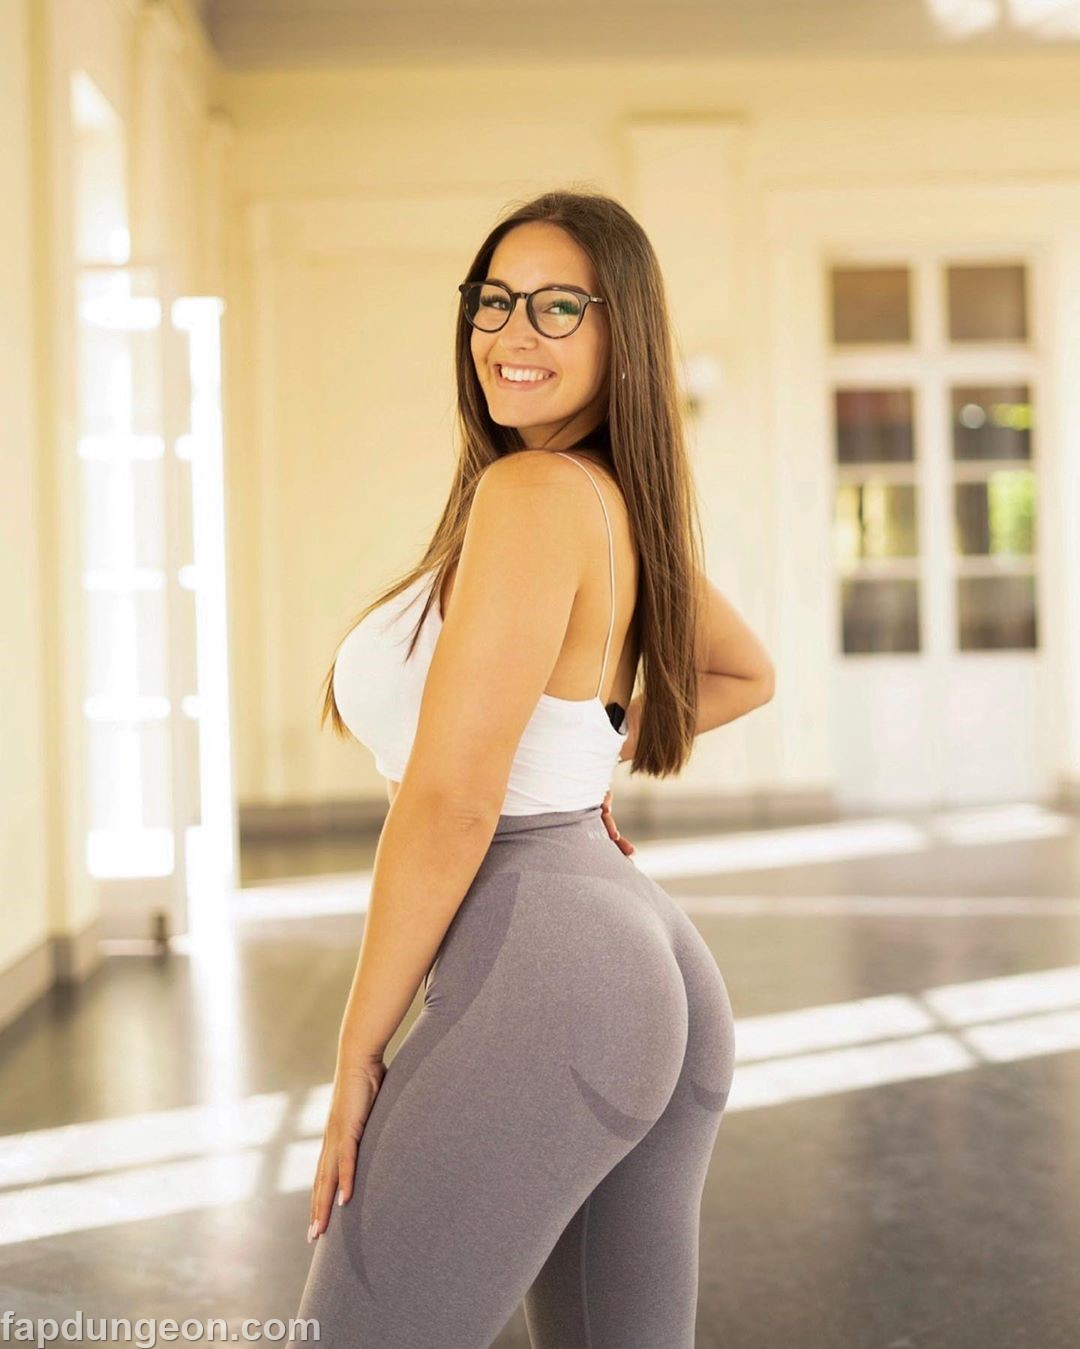 Laramarieconrads Ass